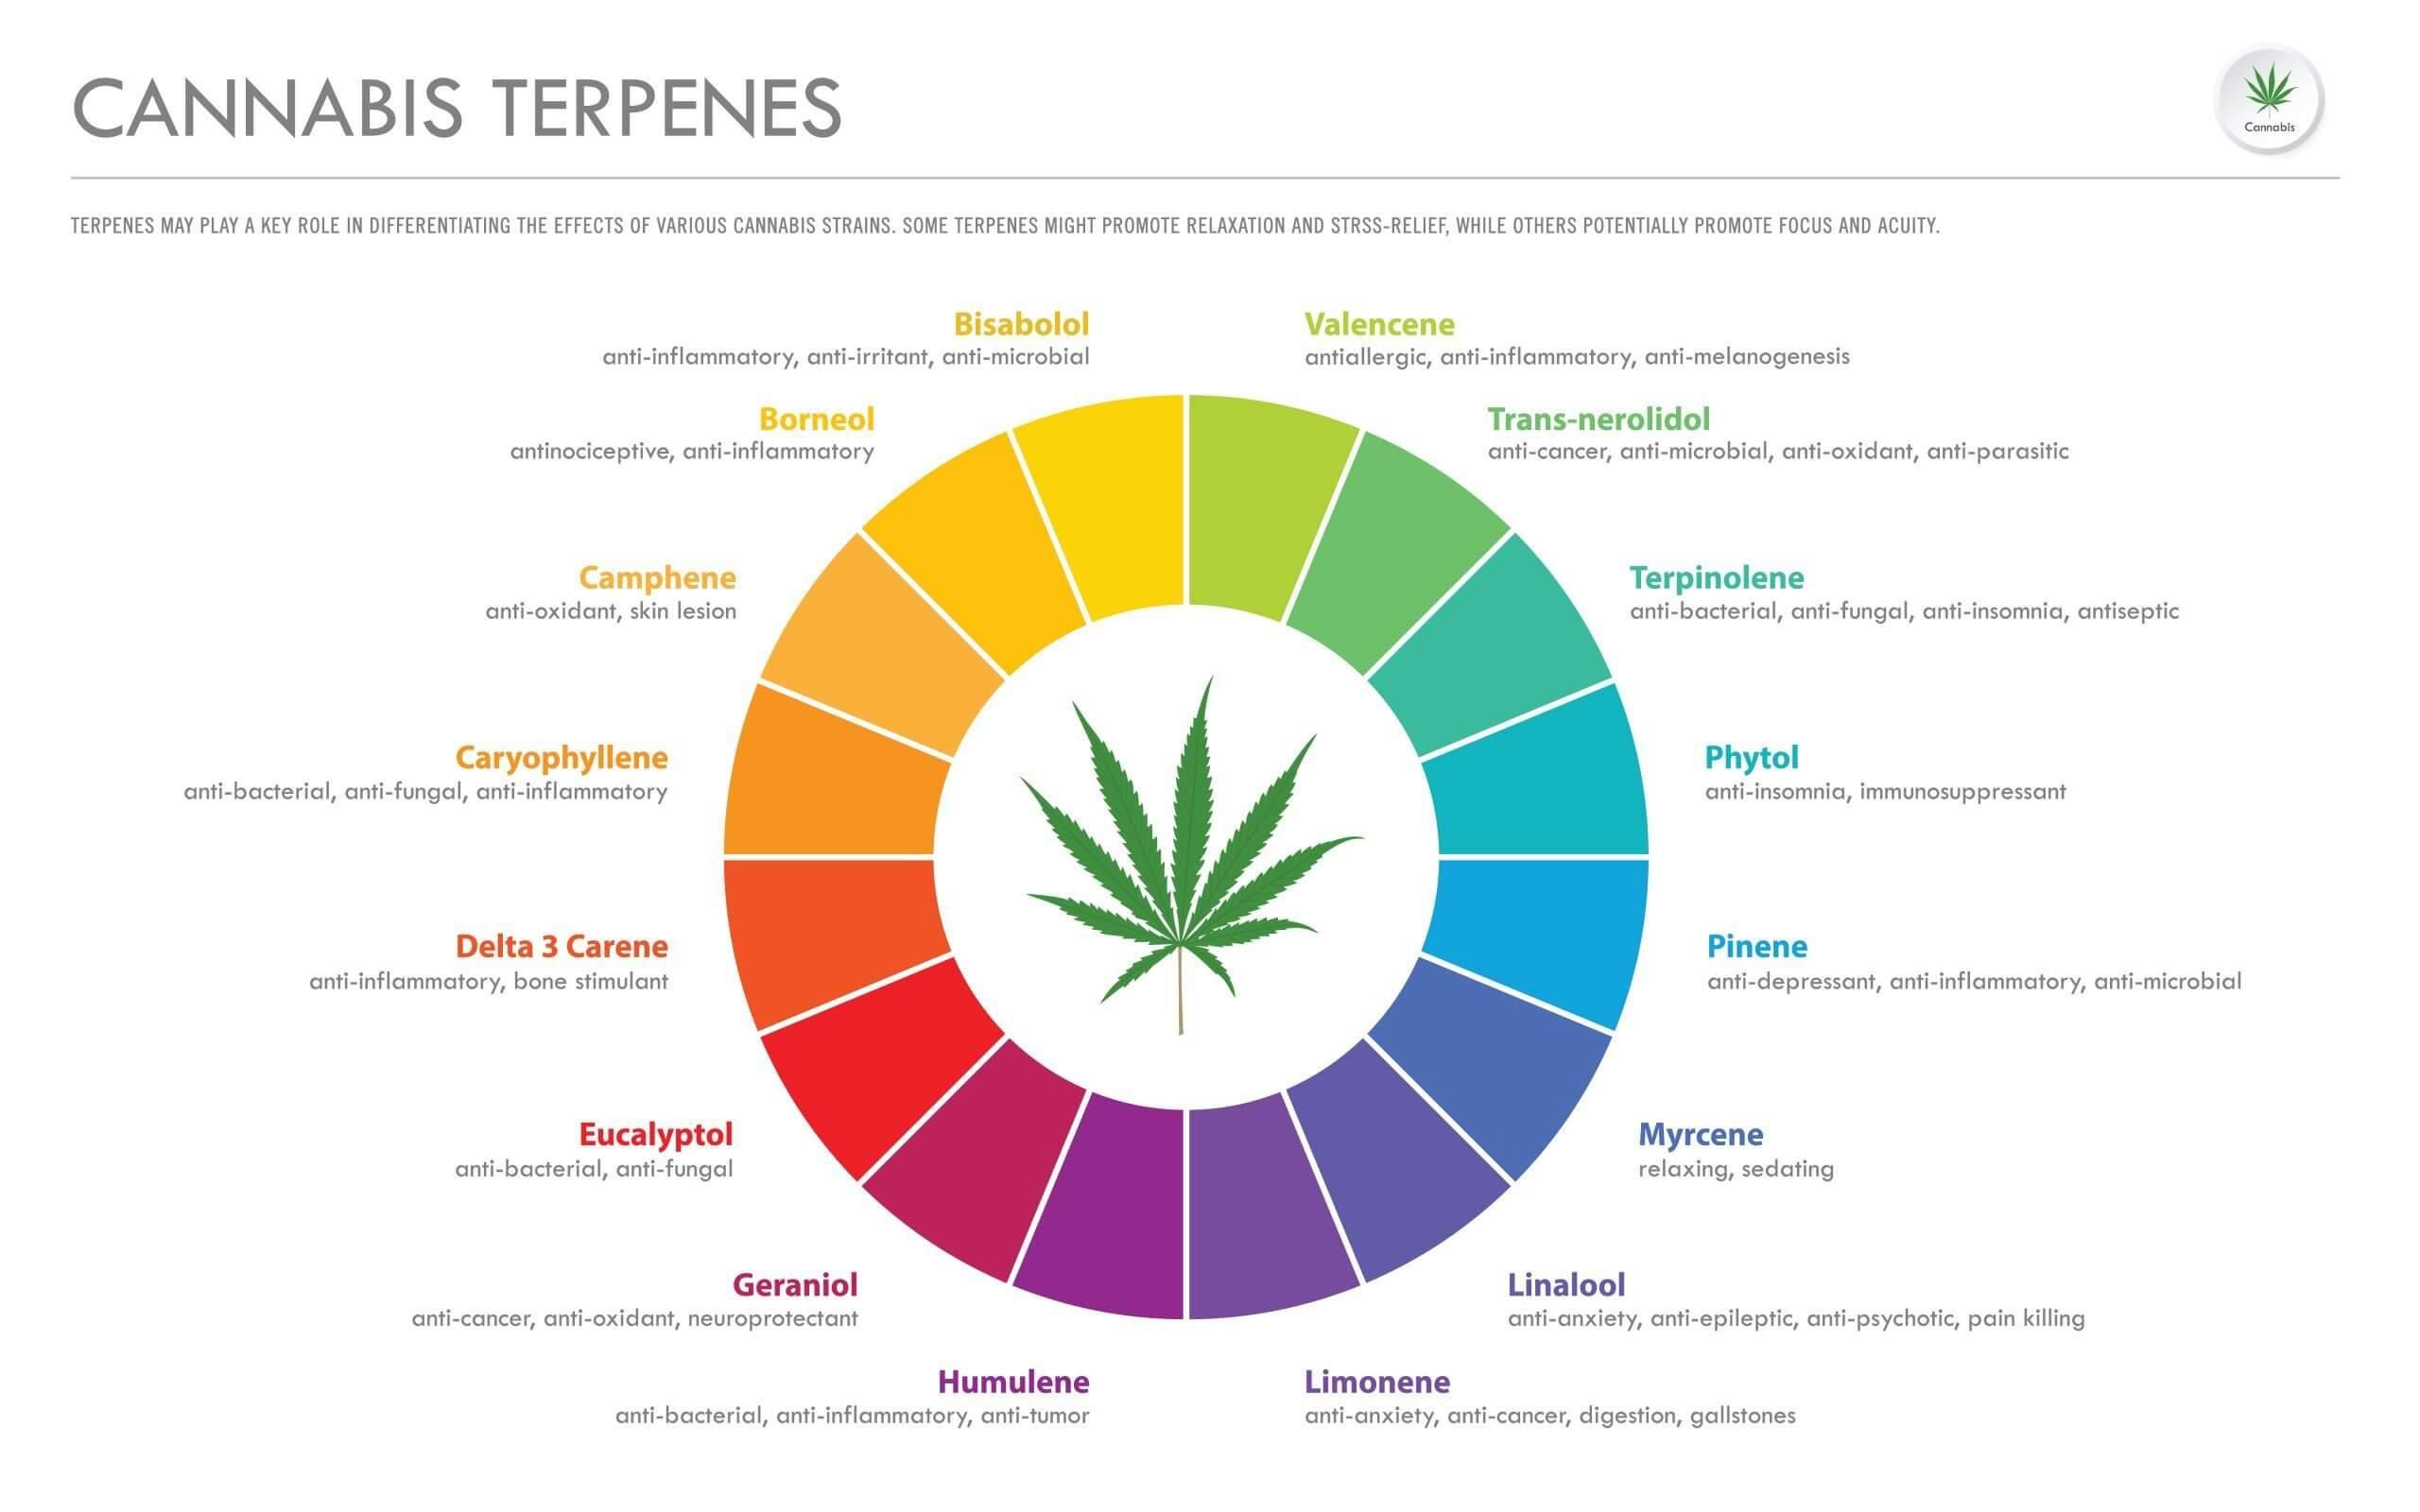 Vários tipos de terpenos e efeitos na maconha